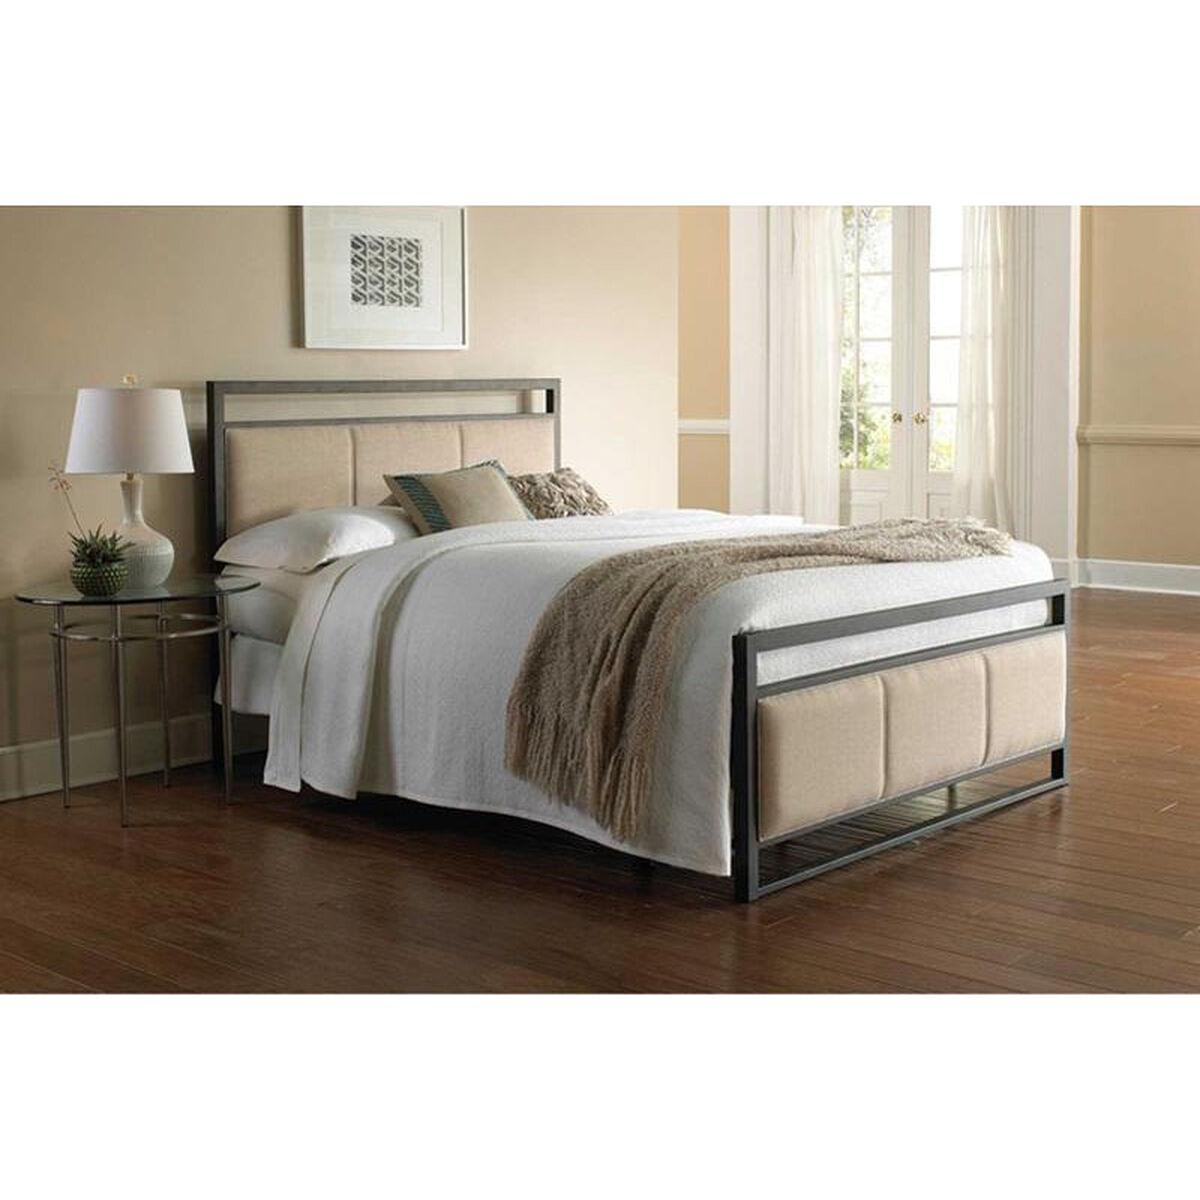 Can A Full Bed Frame Fit A Queen Mattress